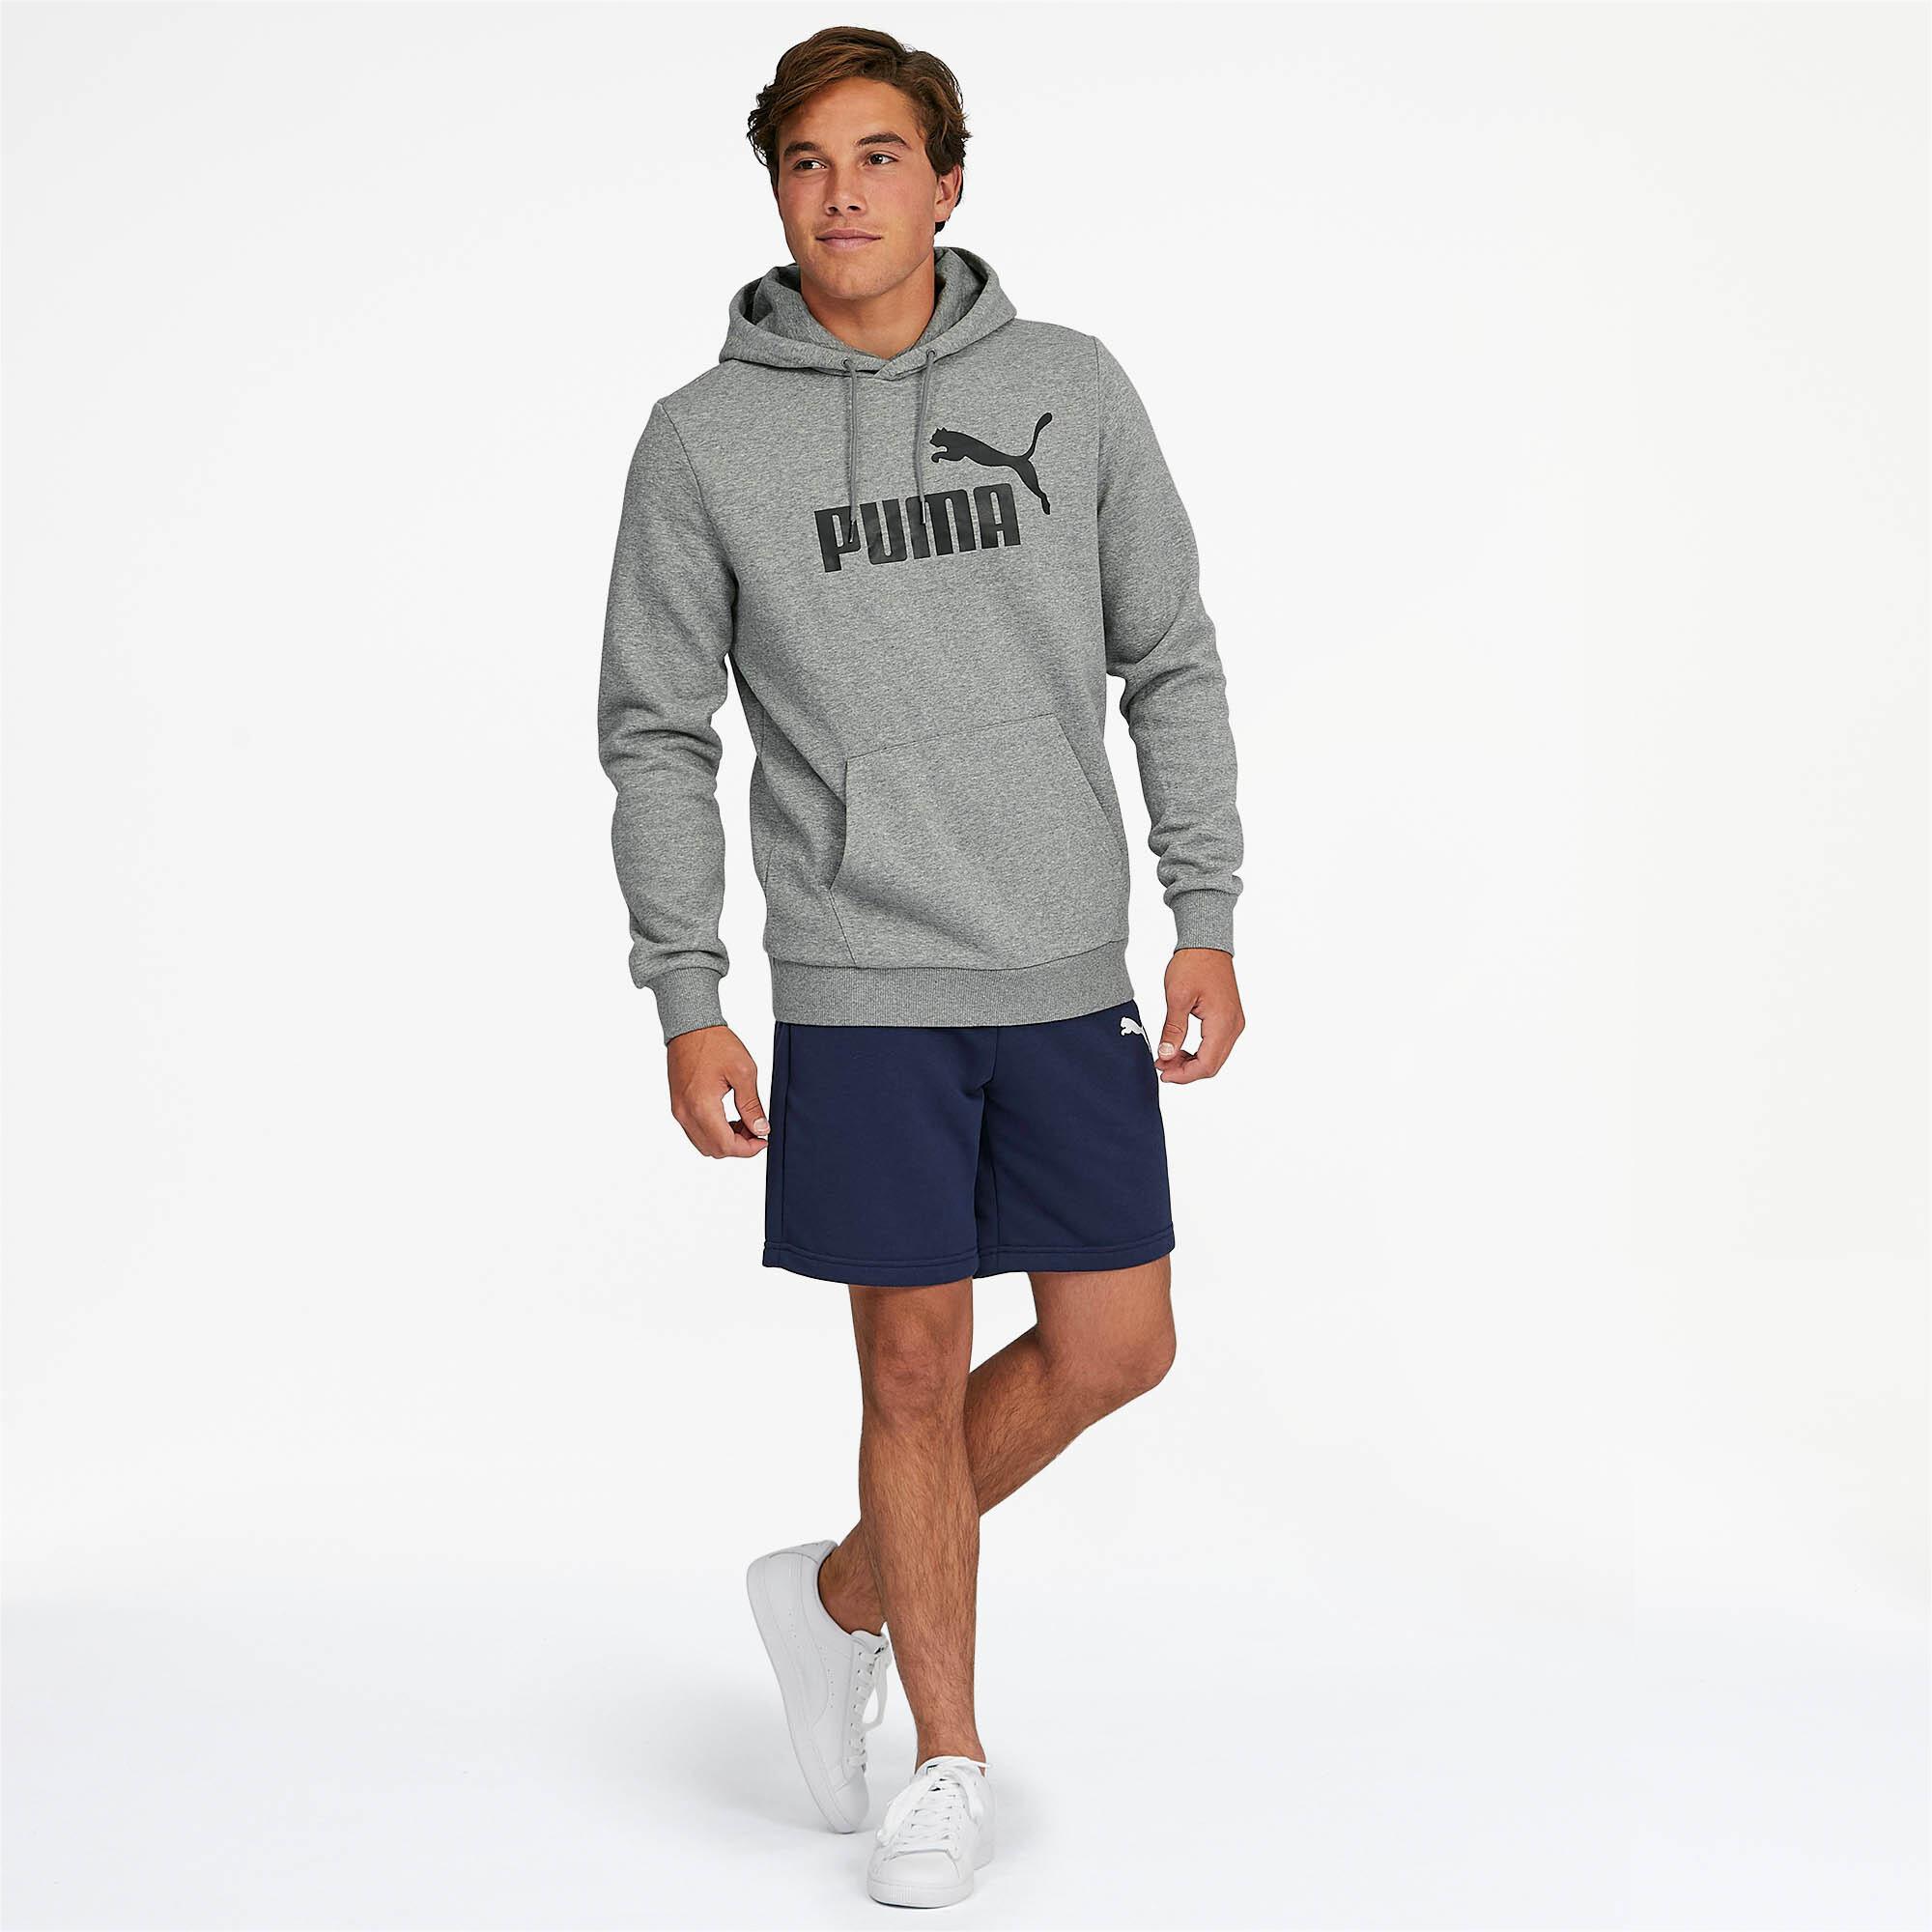 Puma-Essentials-Uomo-Felpa-con-cappuccio-in-pile-Uomo-Sudore-Basics miniatura 11